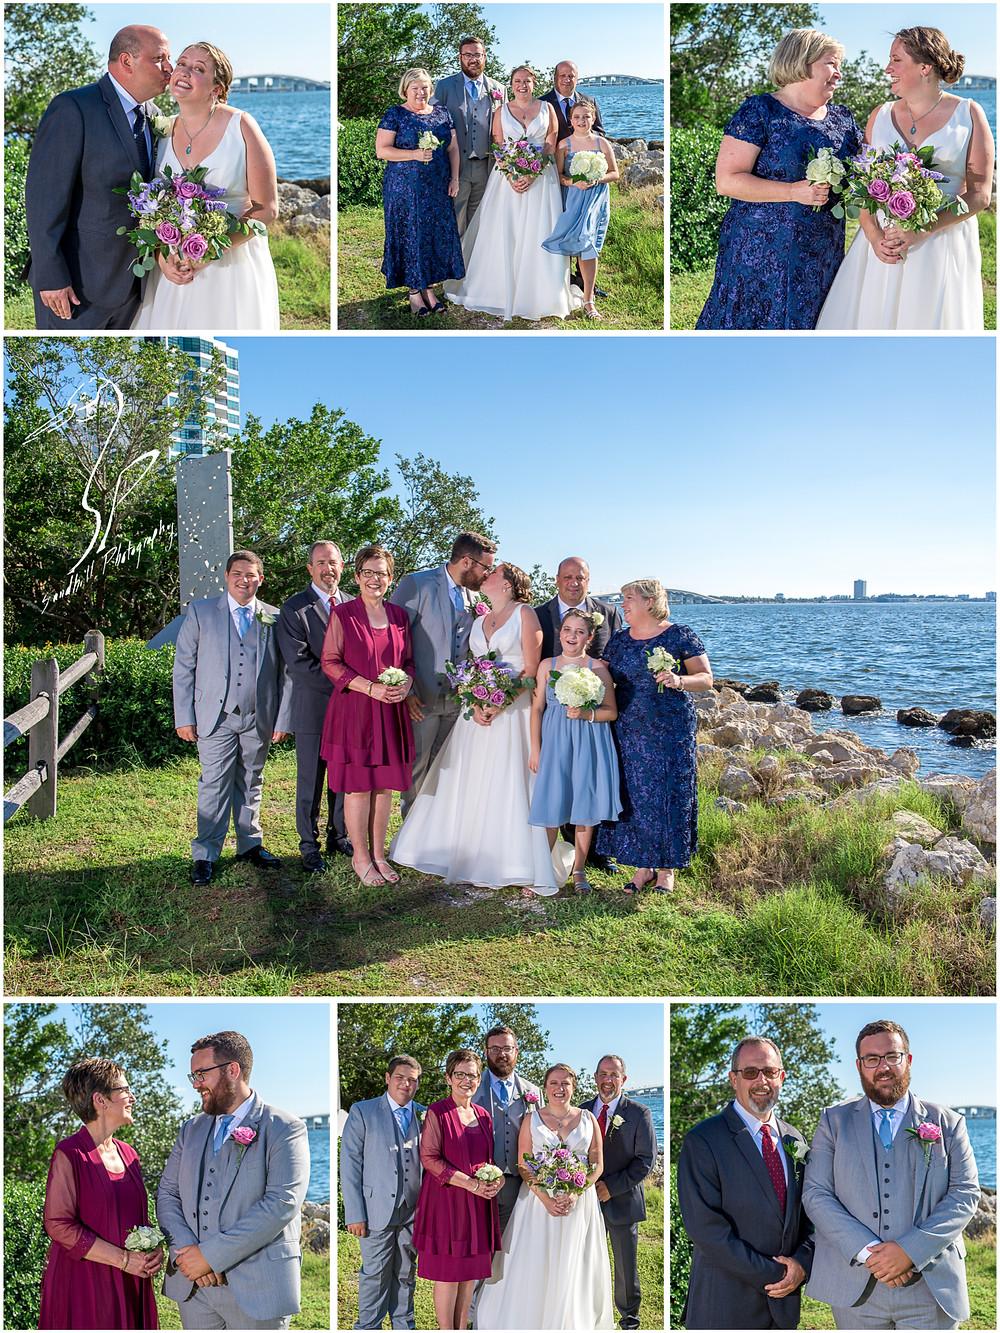 Van Wezel Wedding Photography, Family Pictures on Sarasota bay with Ringling Bridge behind